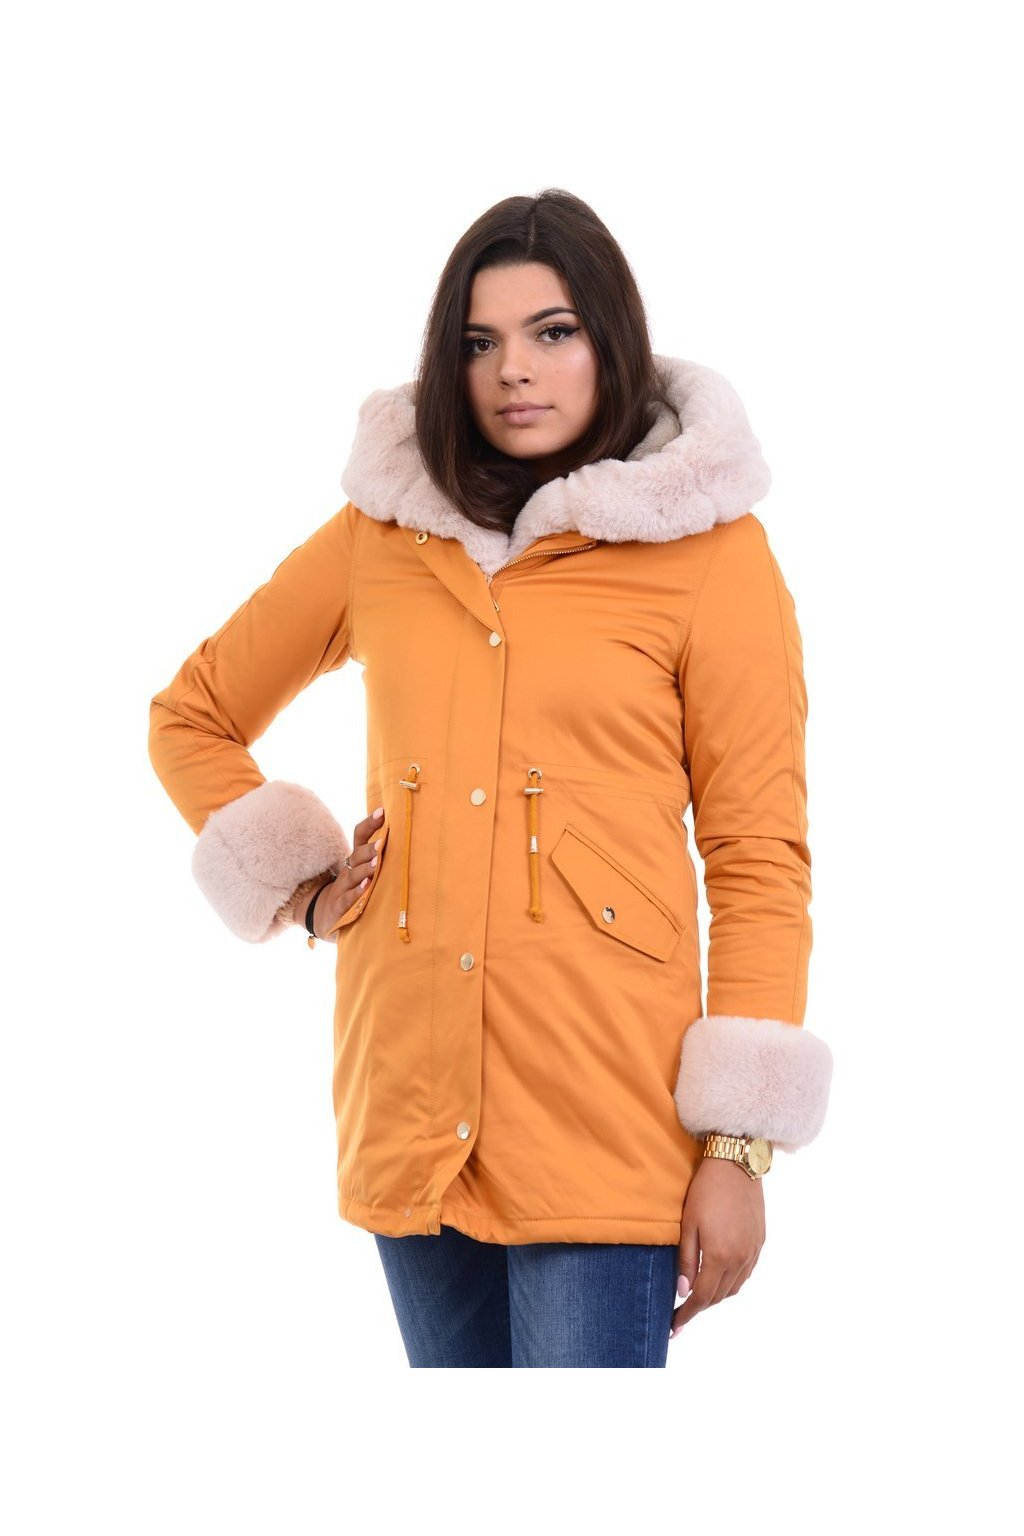 Dámska zimná bunda parka s kožušinou 4856 žltá